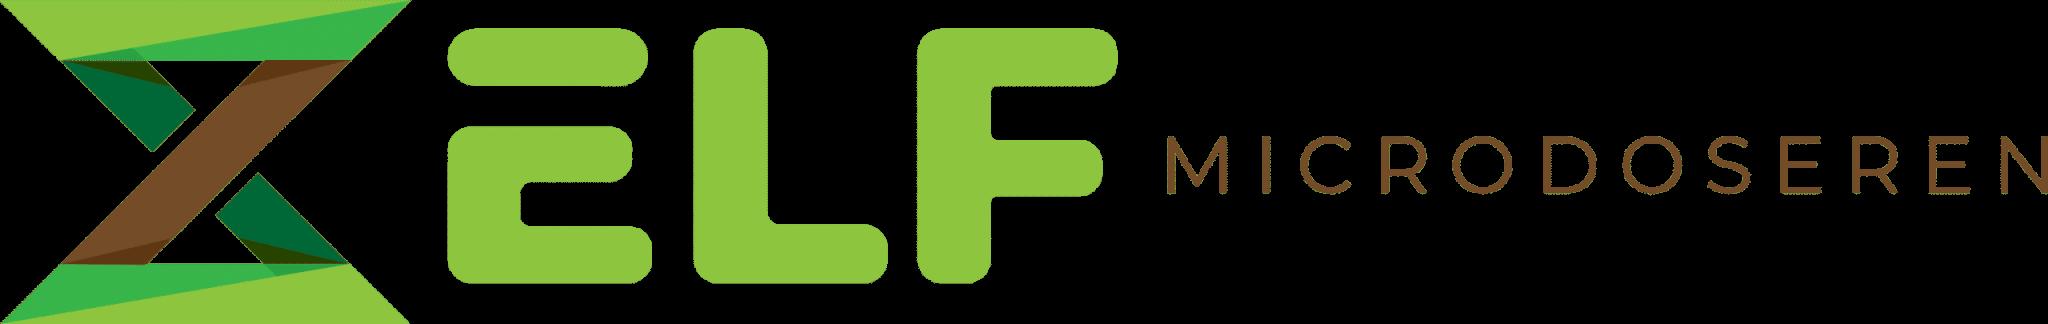 Zelfmicrodoseren.nl - logo